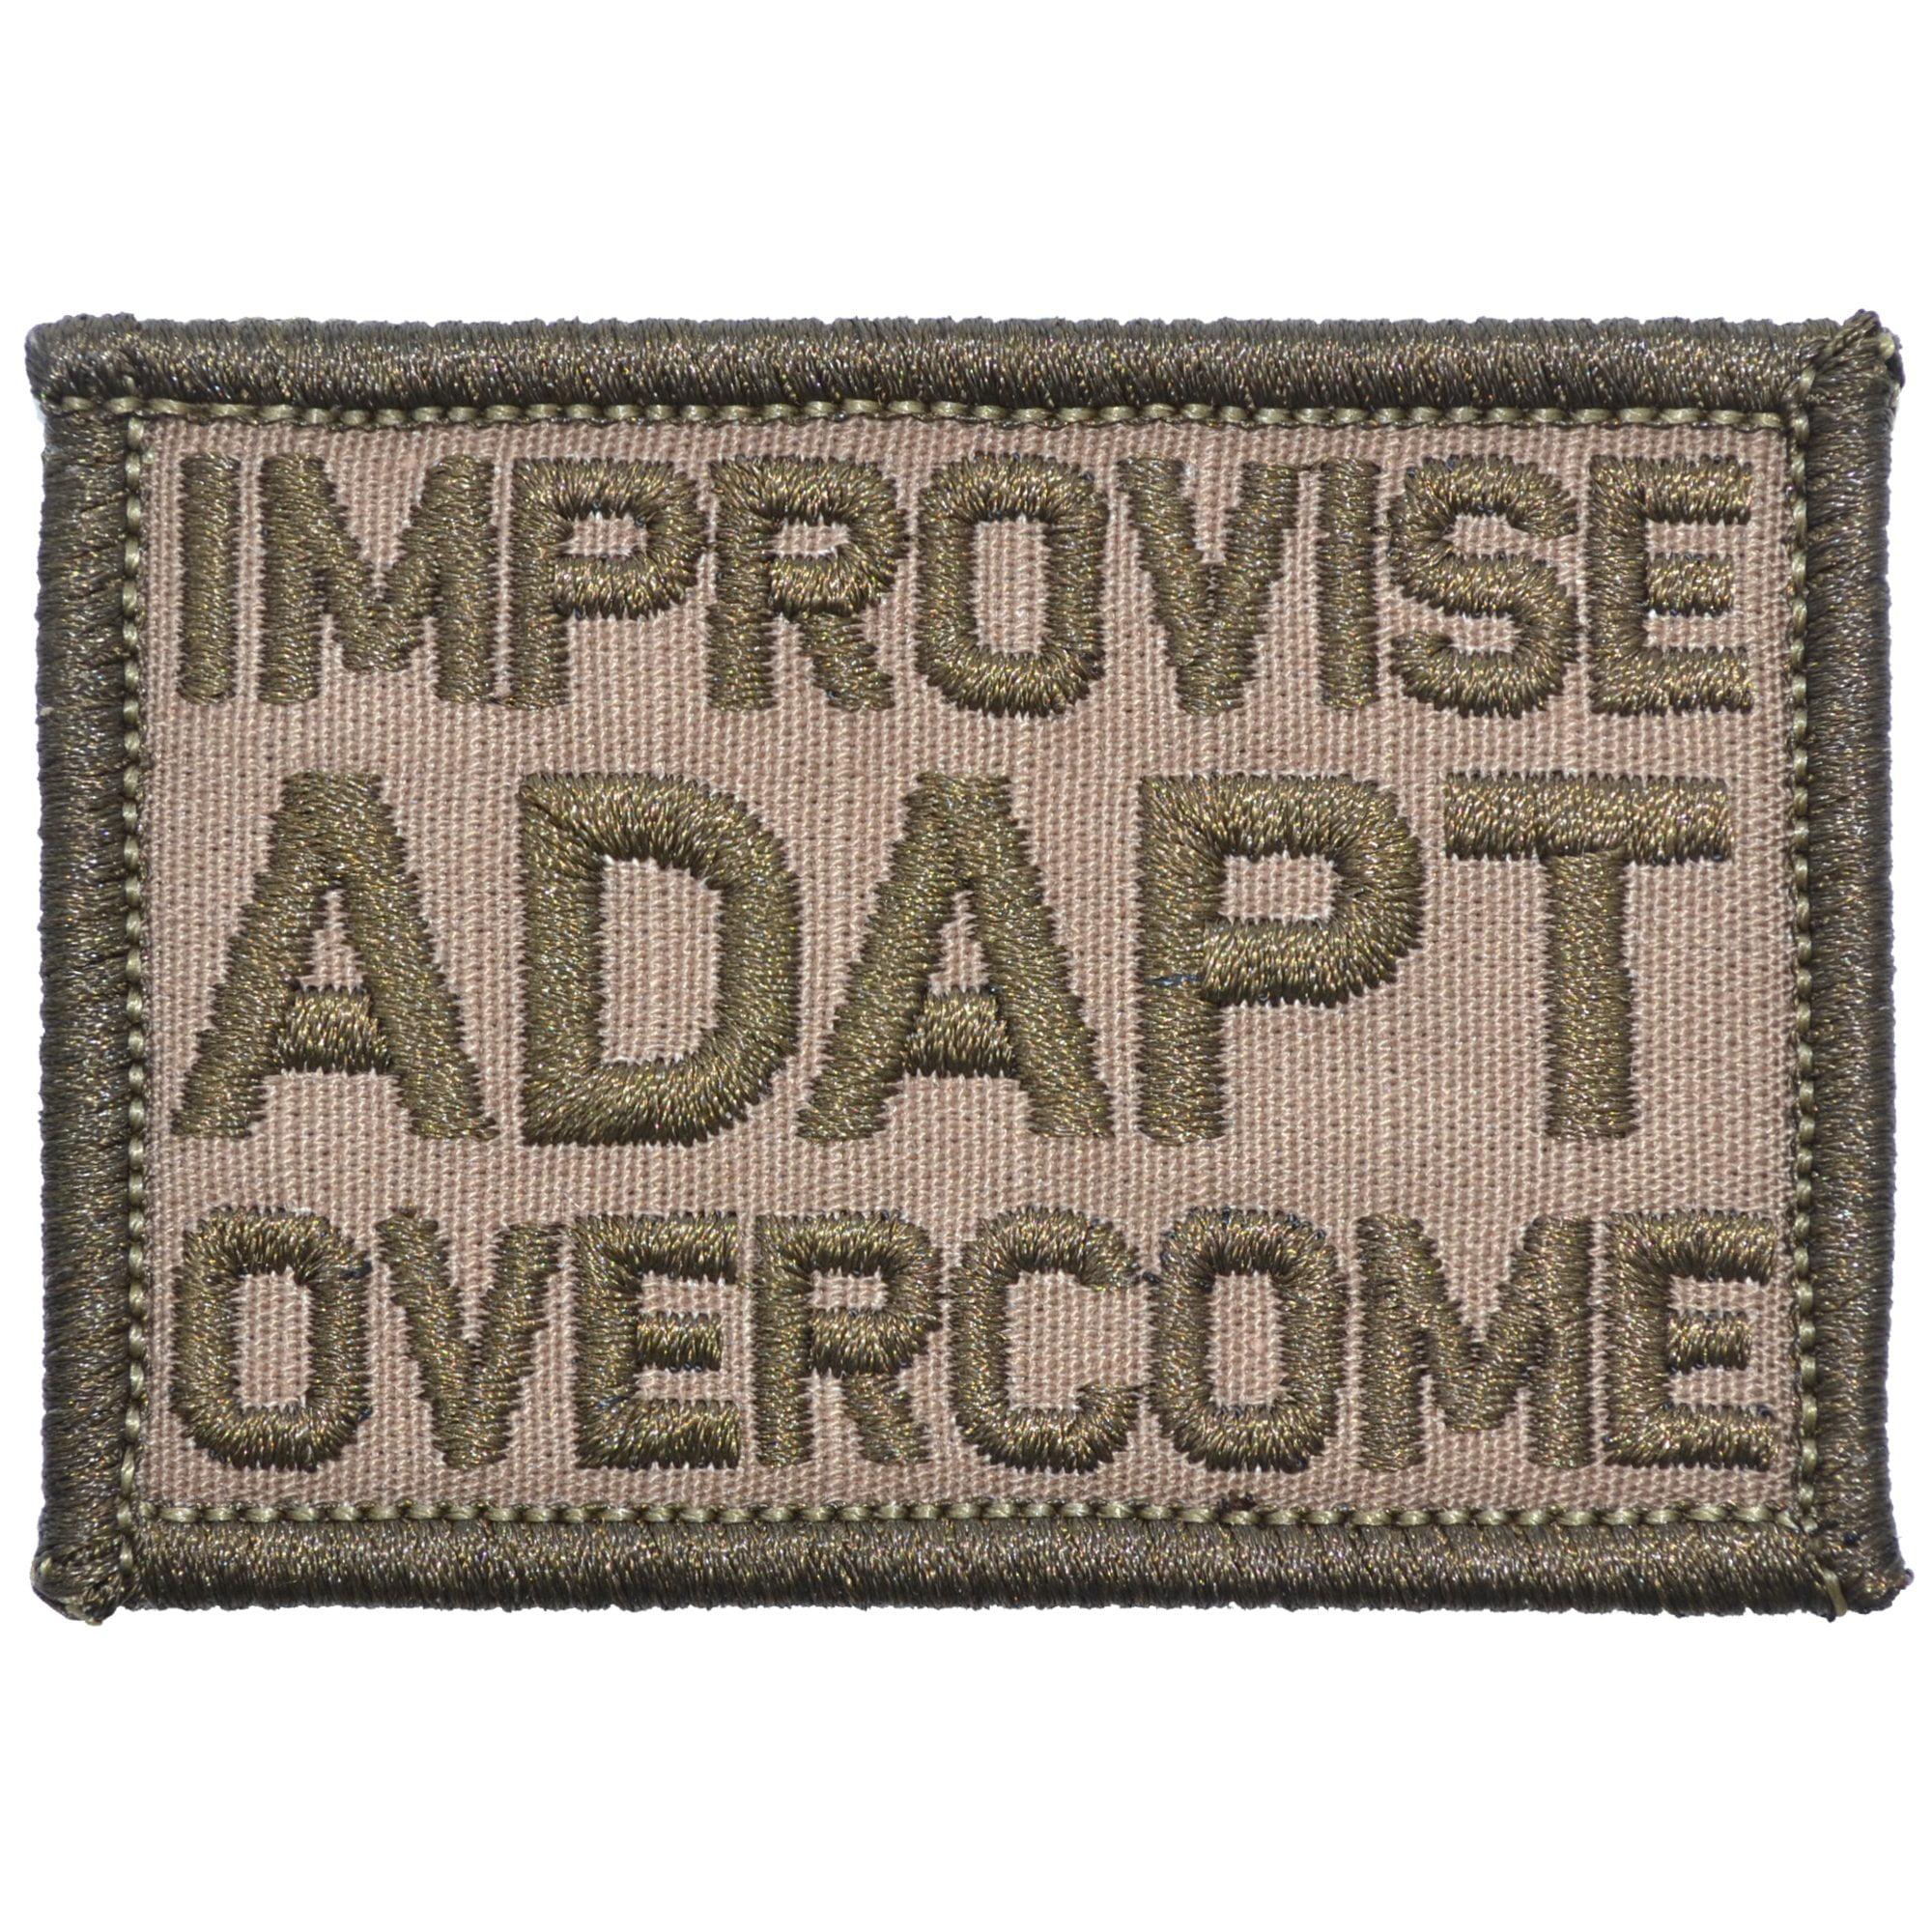 Improvise Adapt Overcome - 2x3 Patch